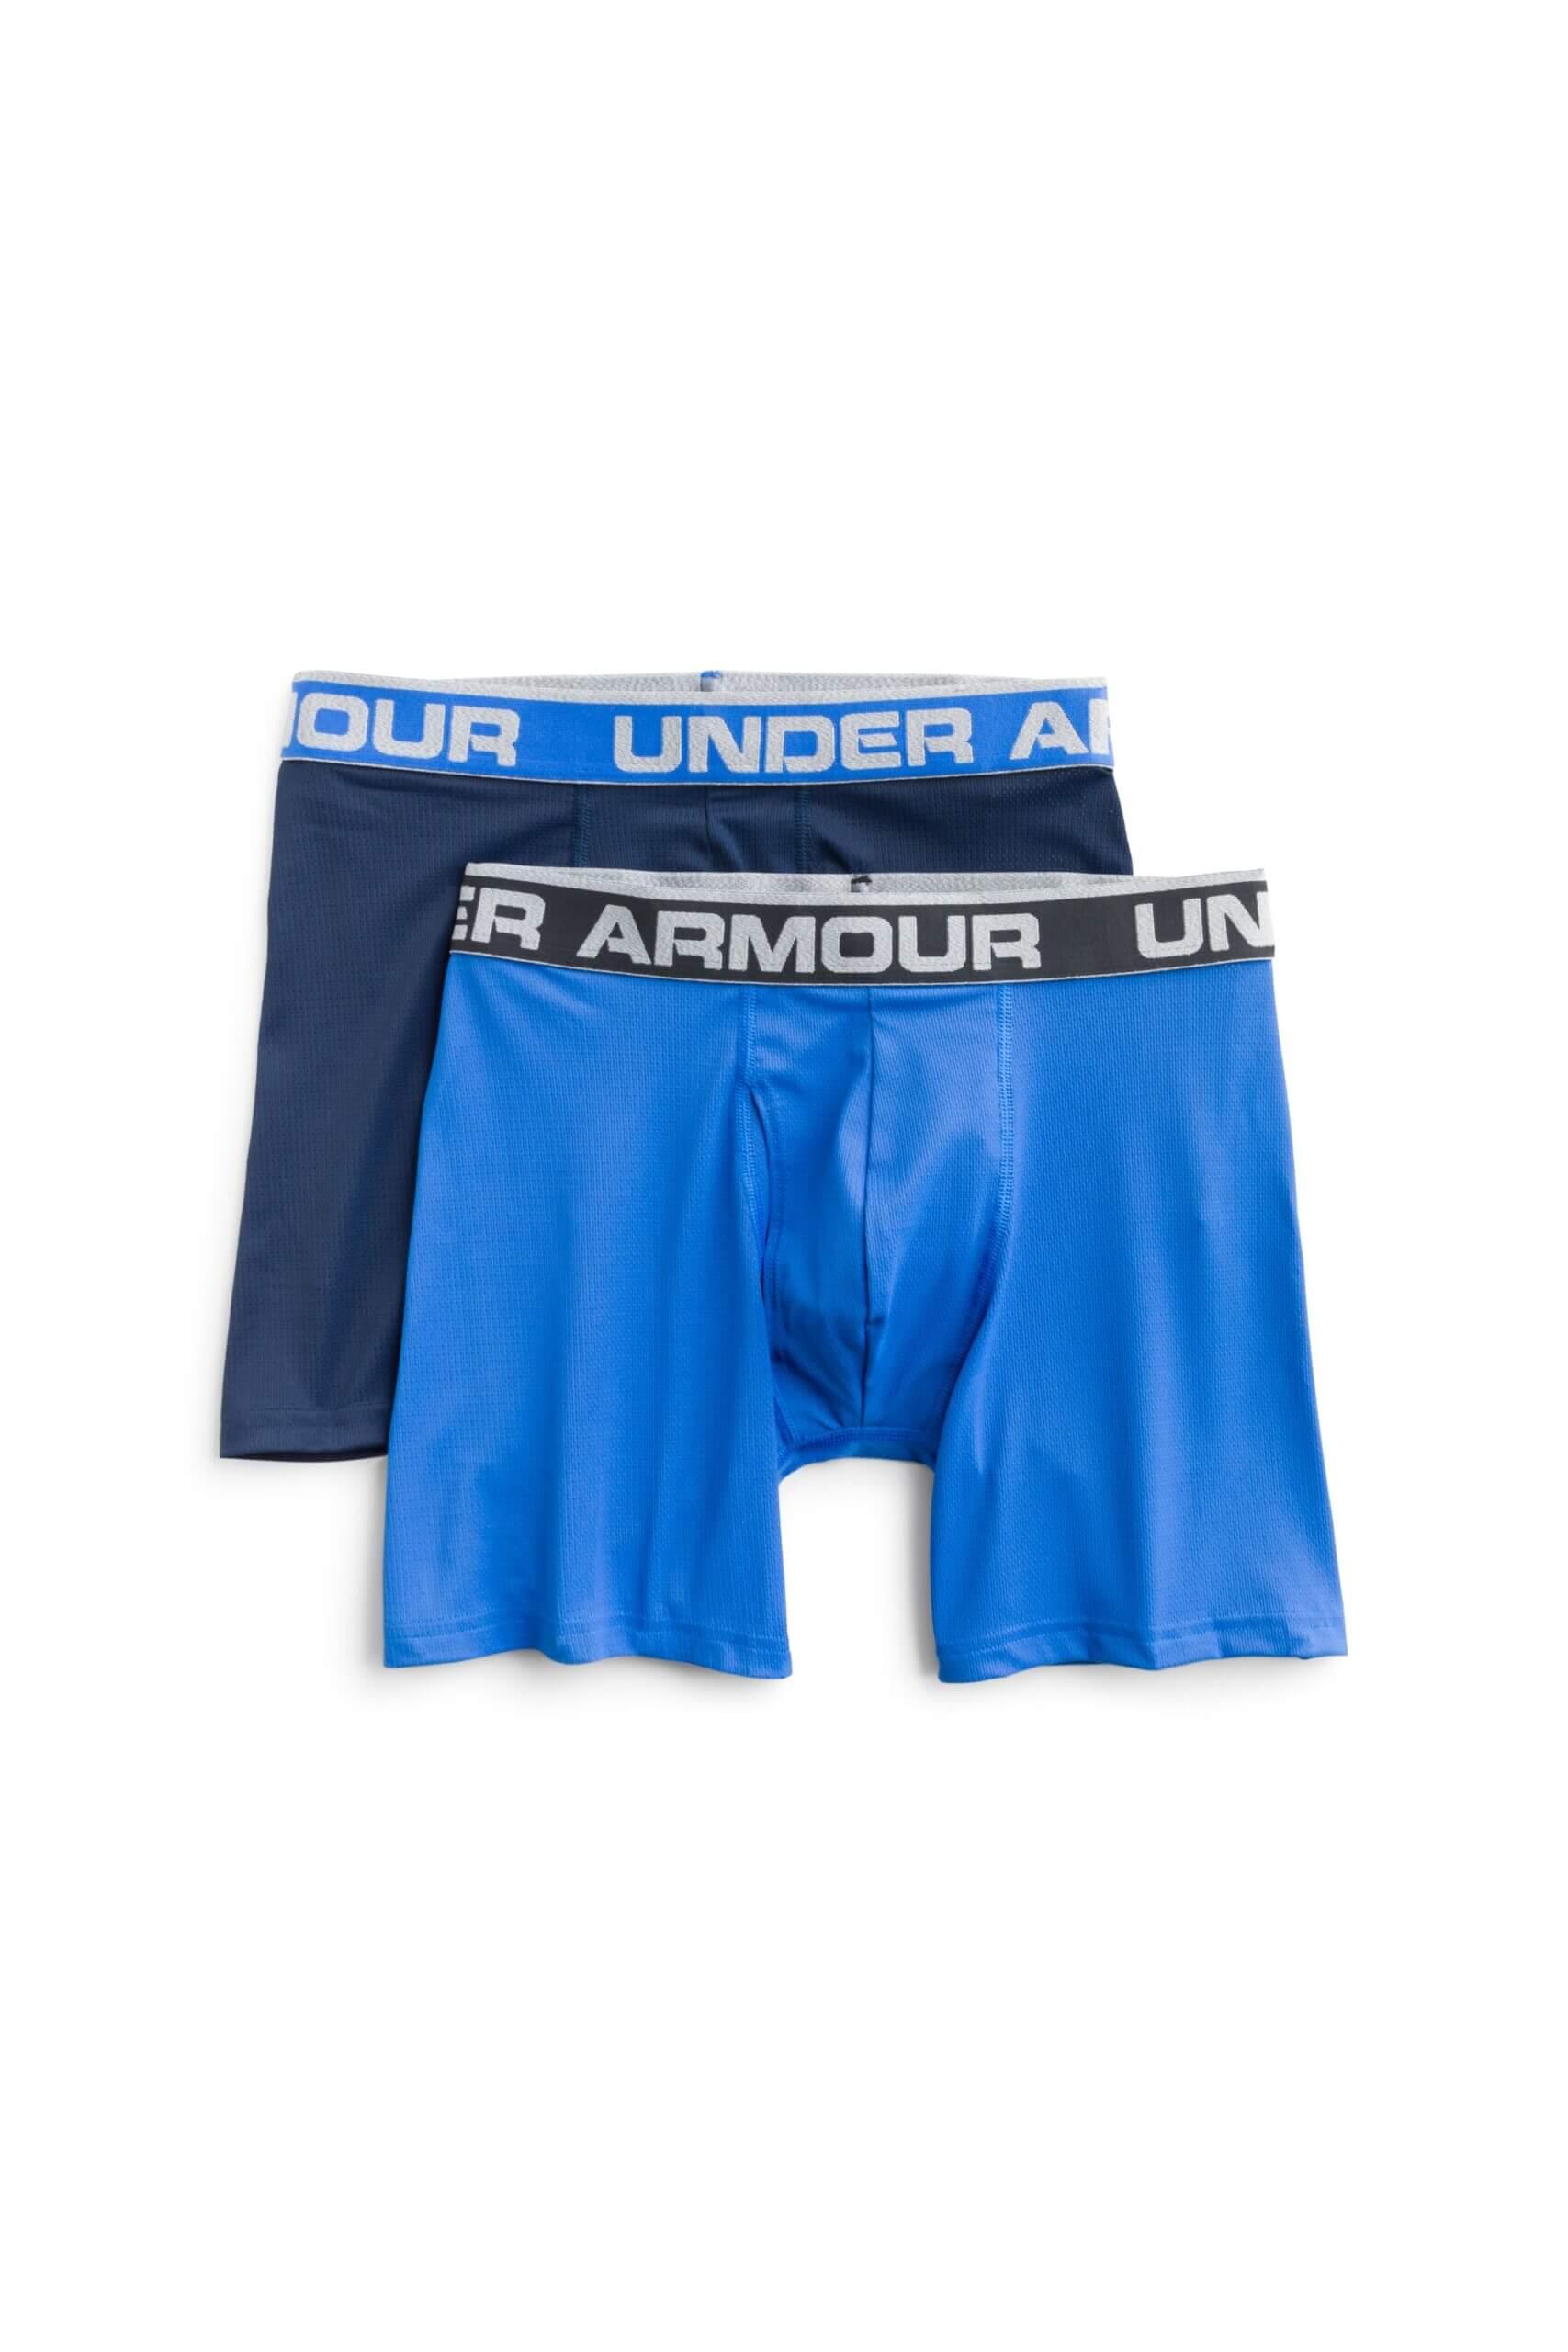 Stitch Fix Men's blue two pack of Under Armour boxer briefs.